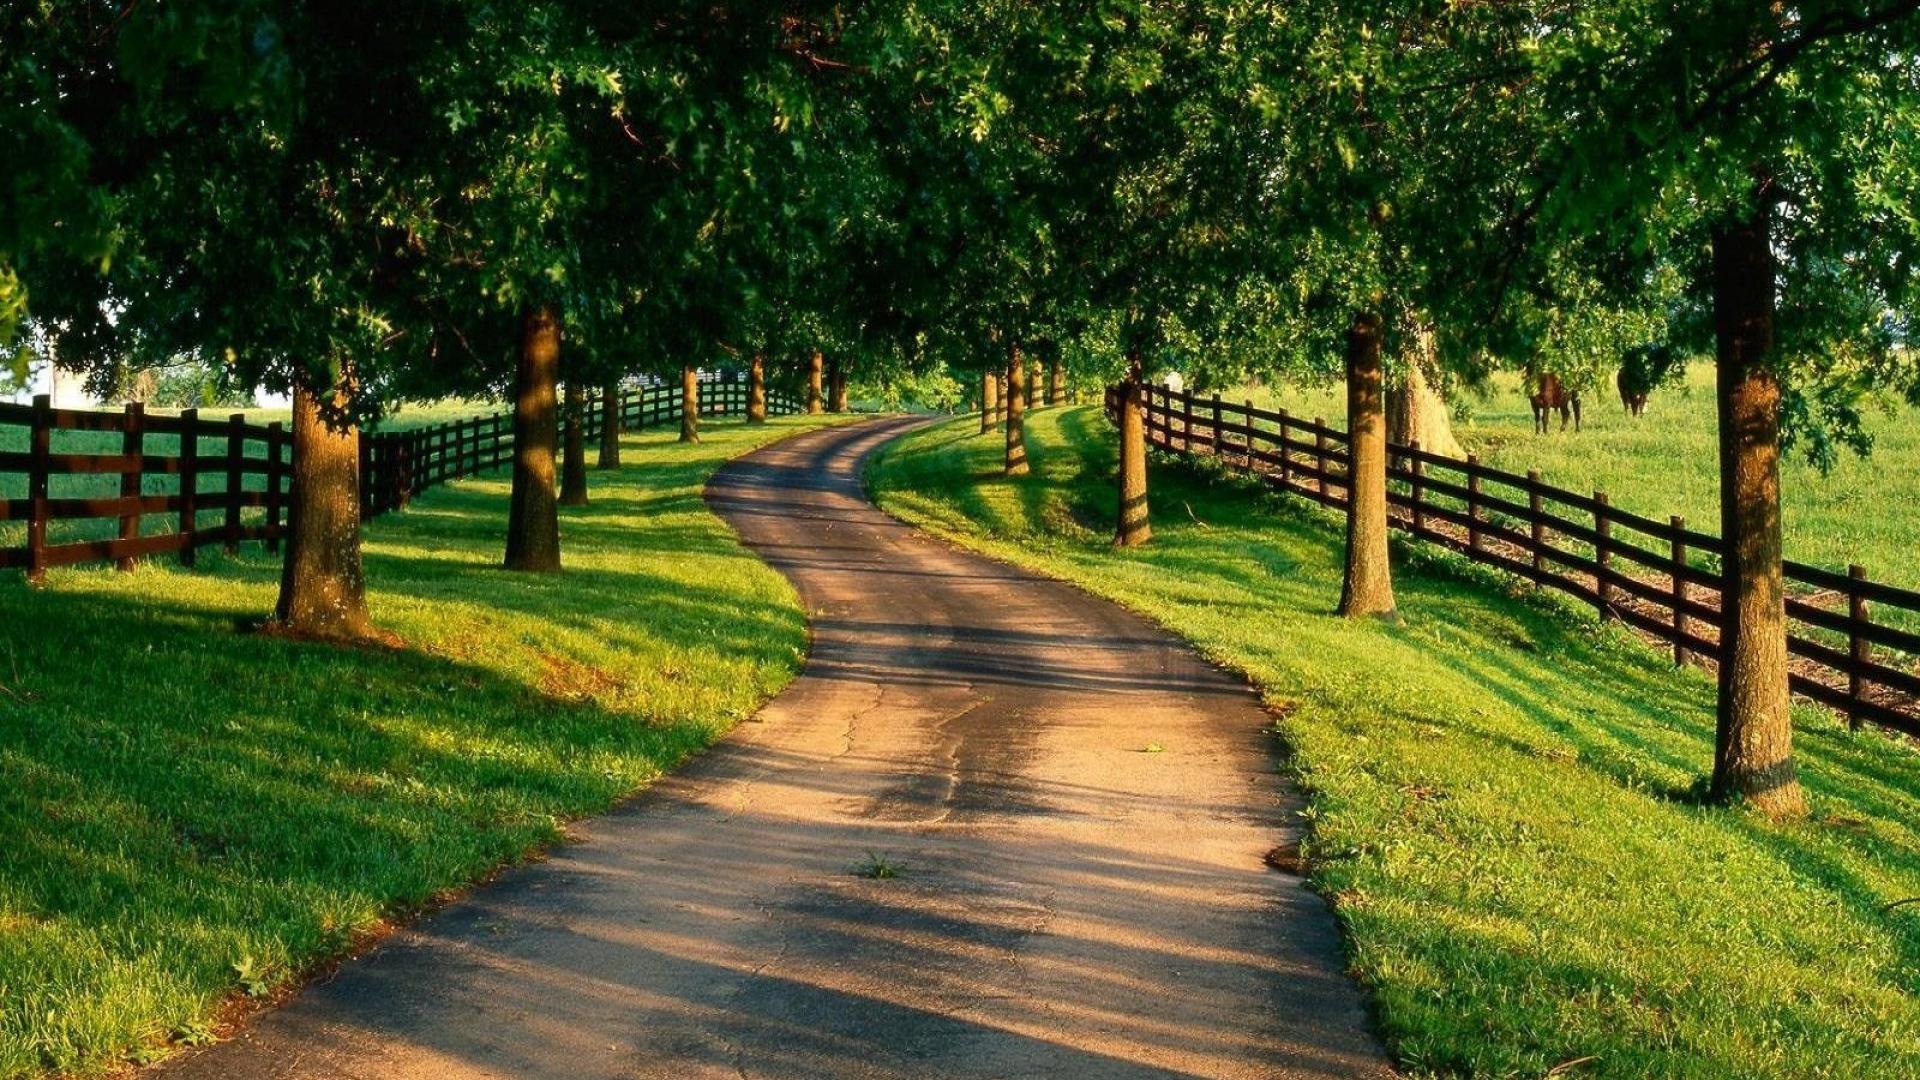 Road, Garden, Track